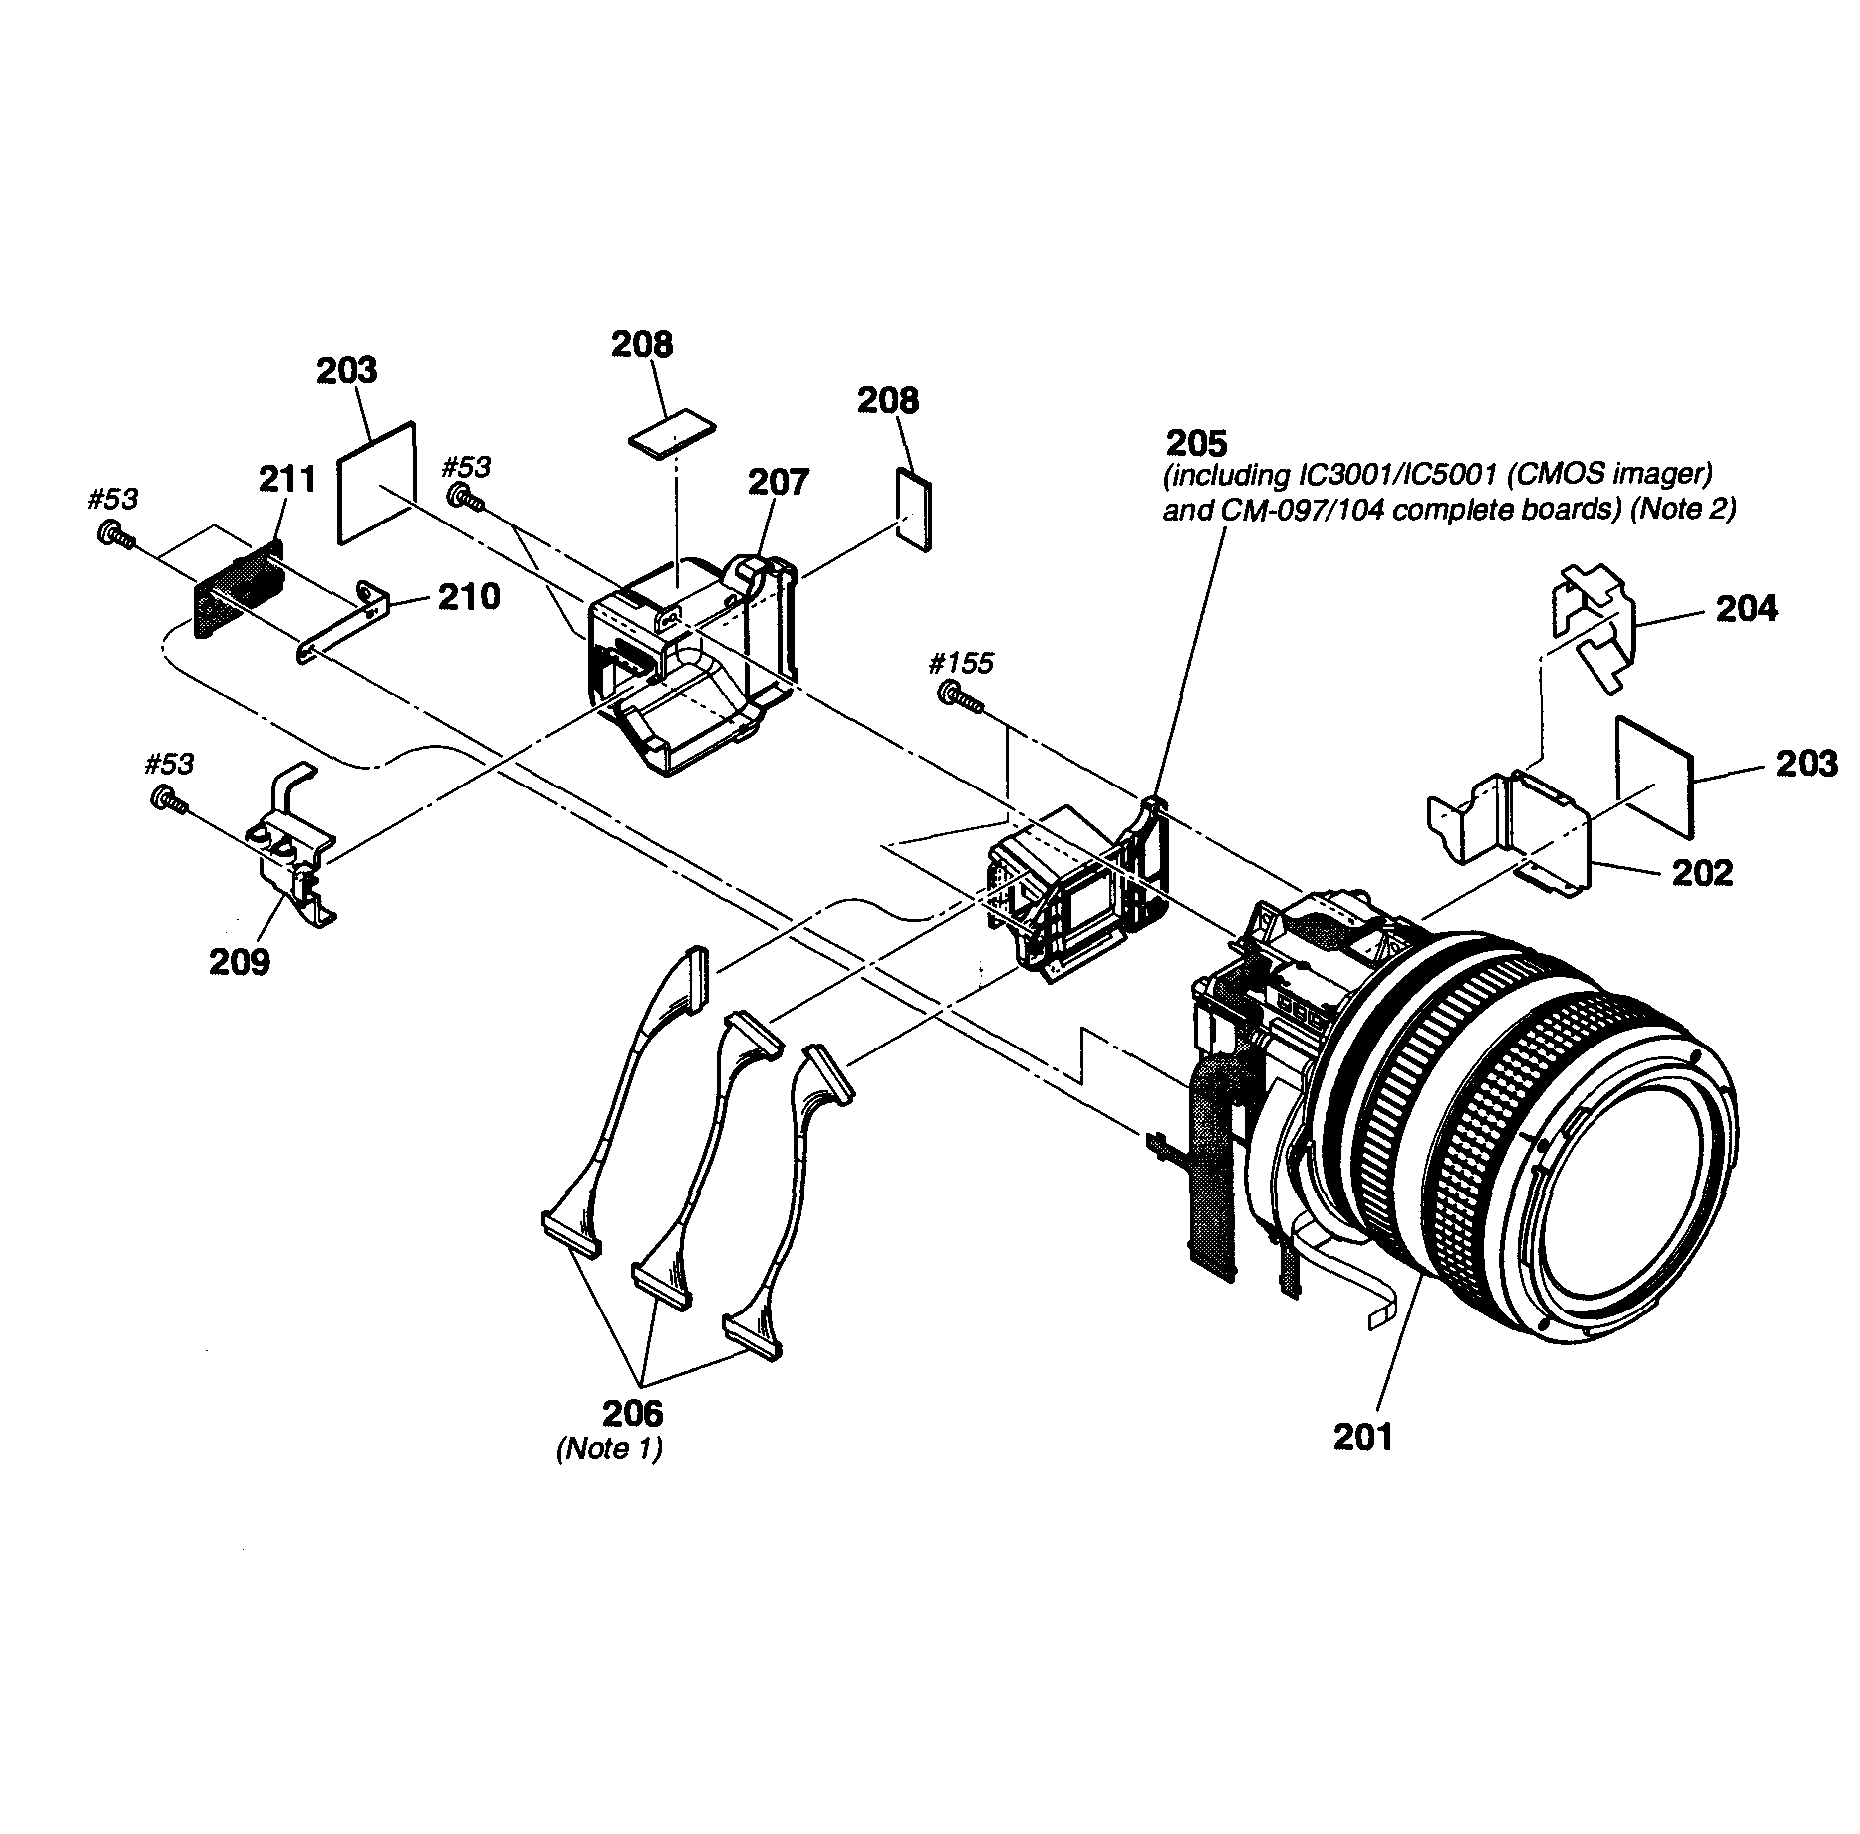 Sony model HDR-FX1000 digital camcorder genuine parts